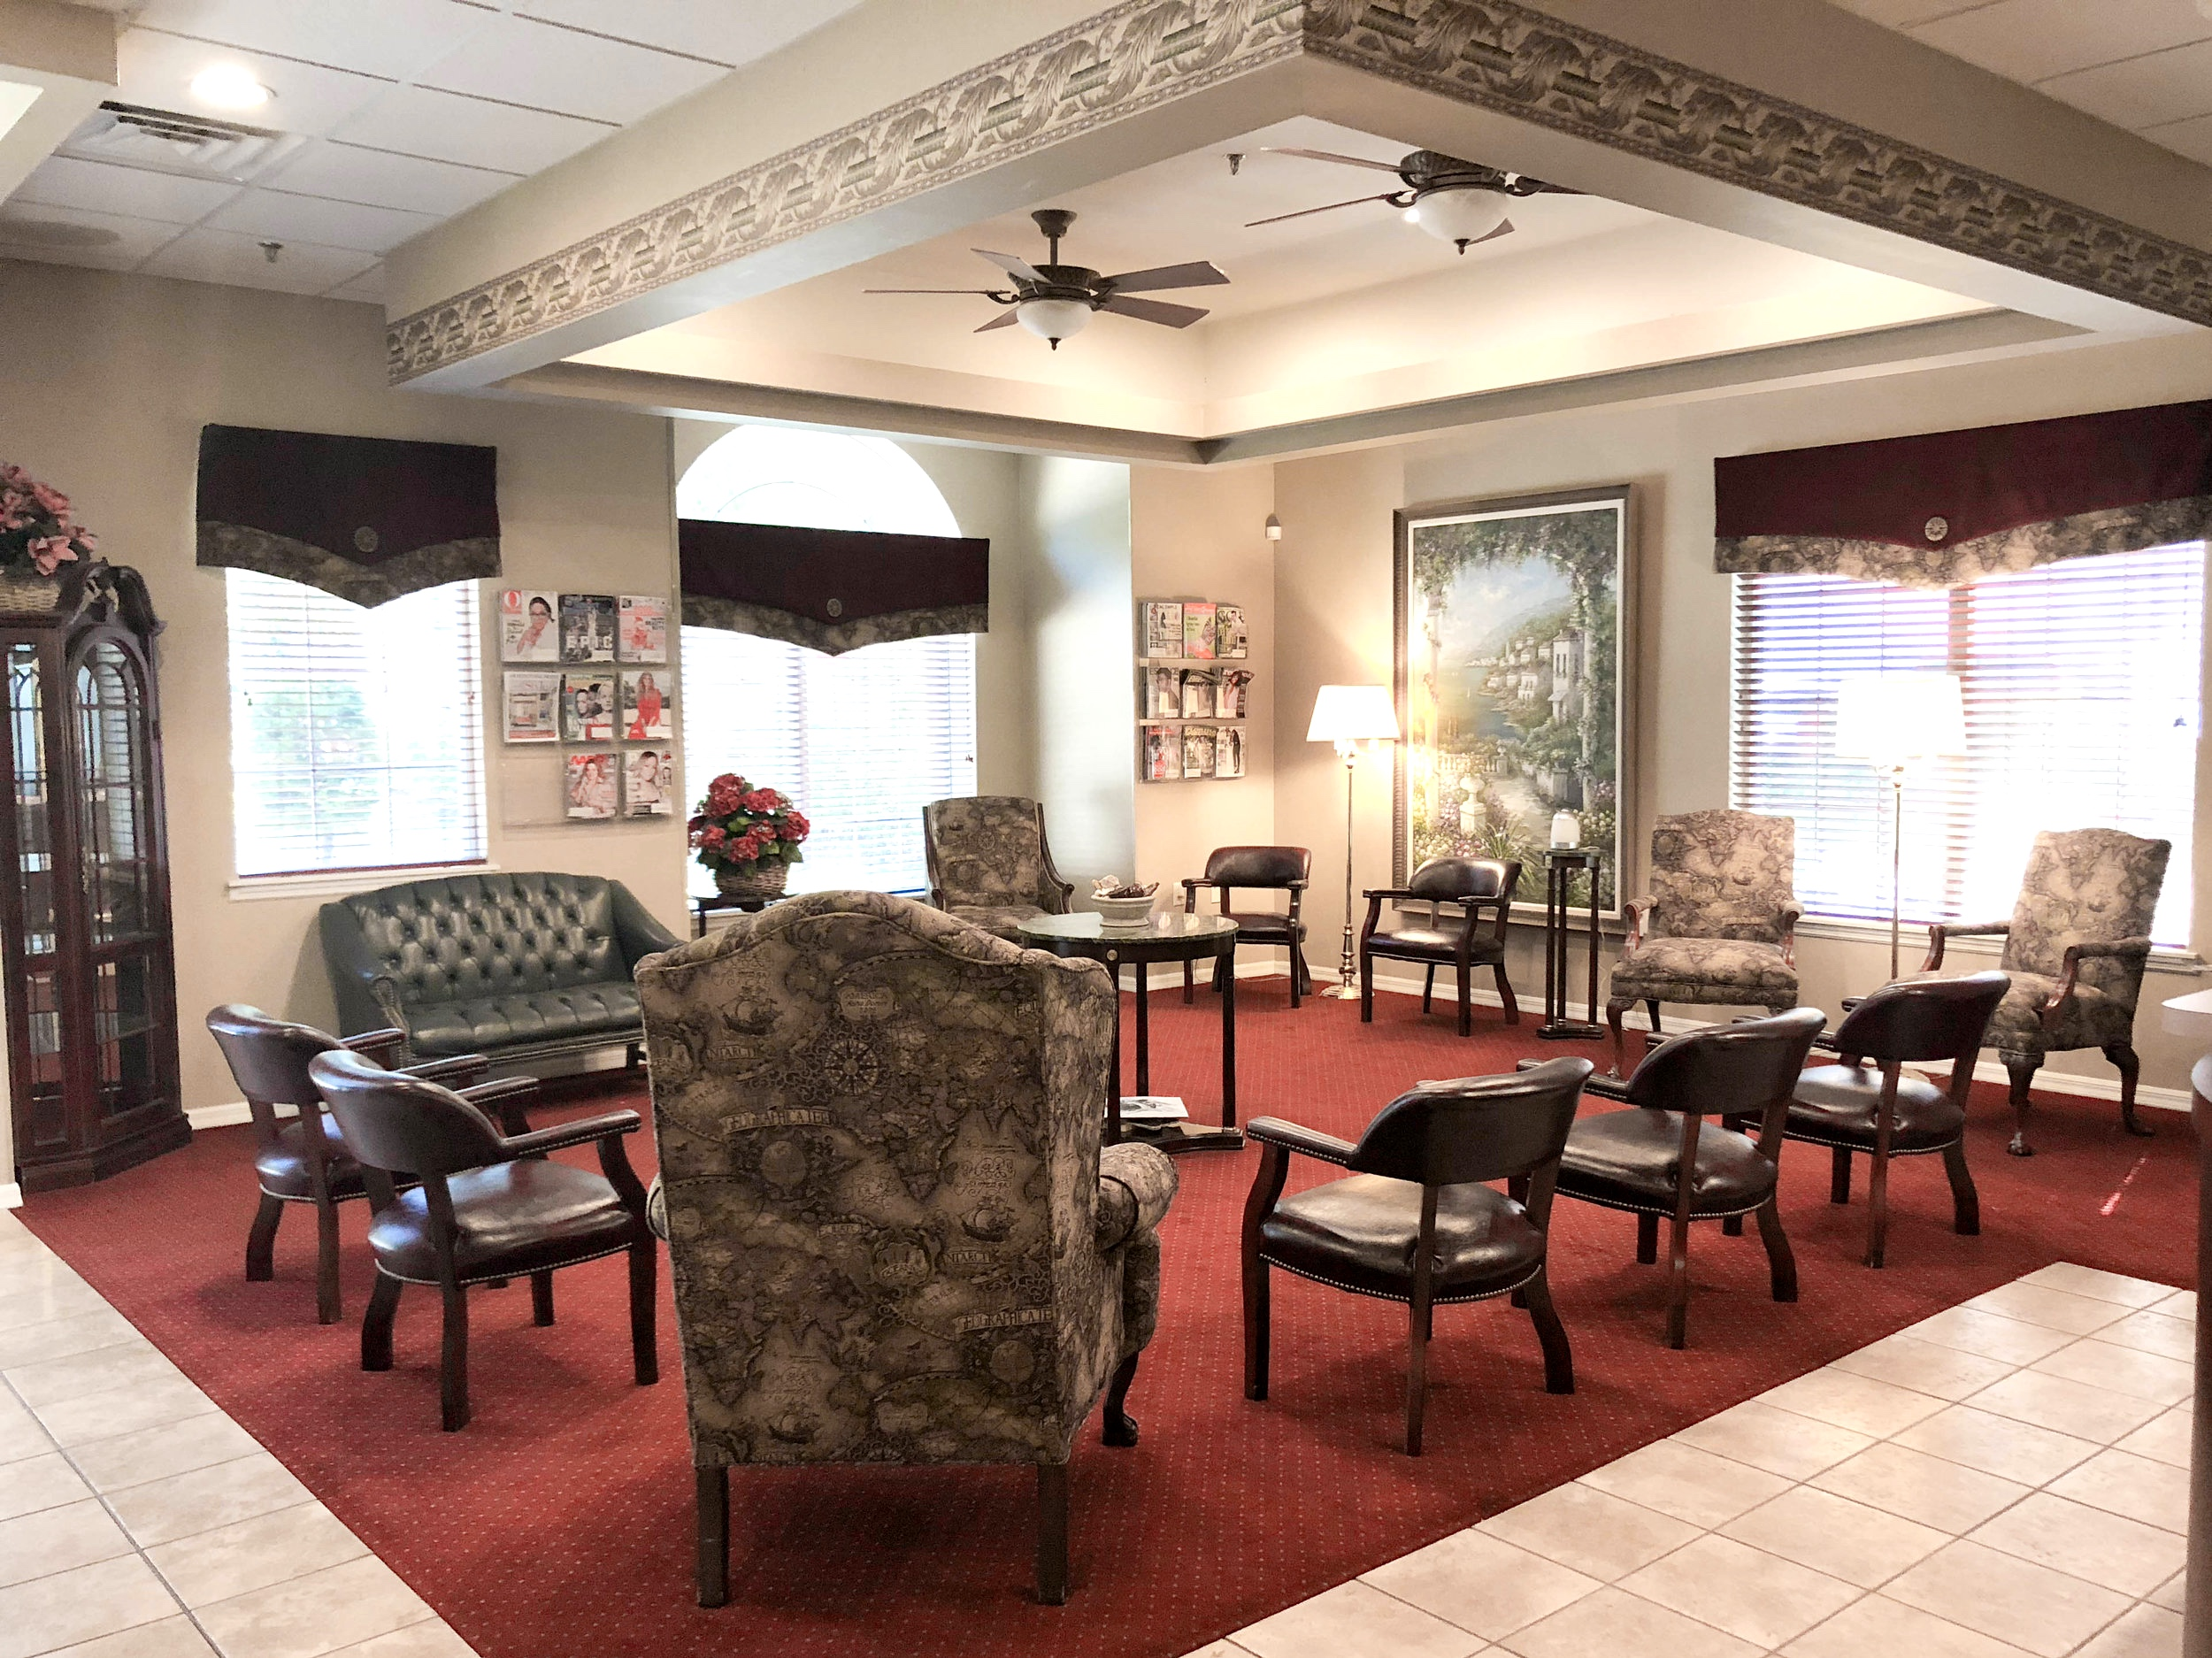 Dr. Cote Orlando Periodontist Waiting Room